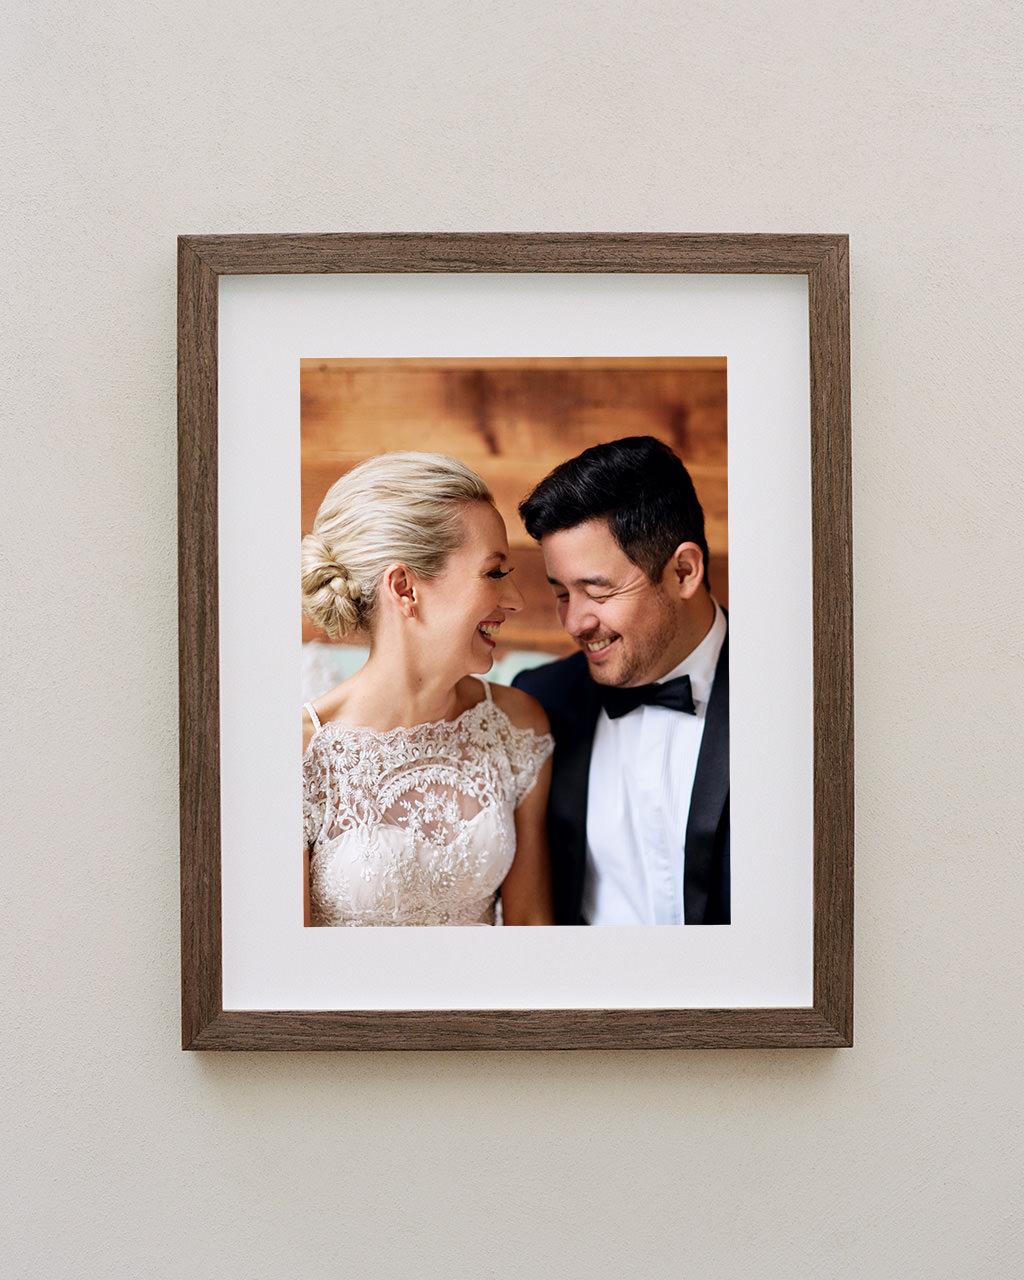 Framed portrait of bride and groom at their Sydney Royal Botanic Gardens wedding